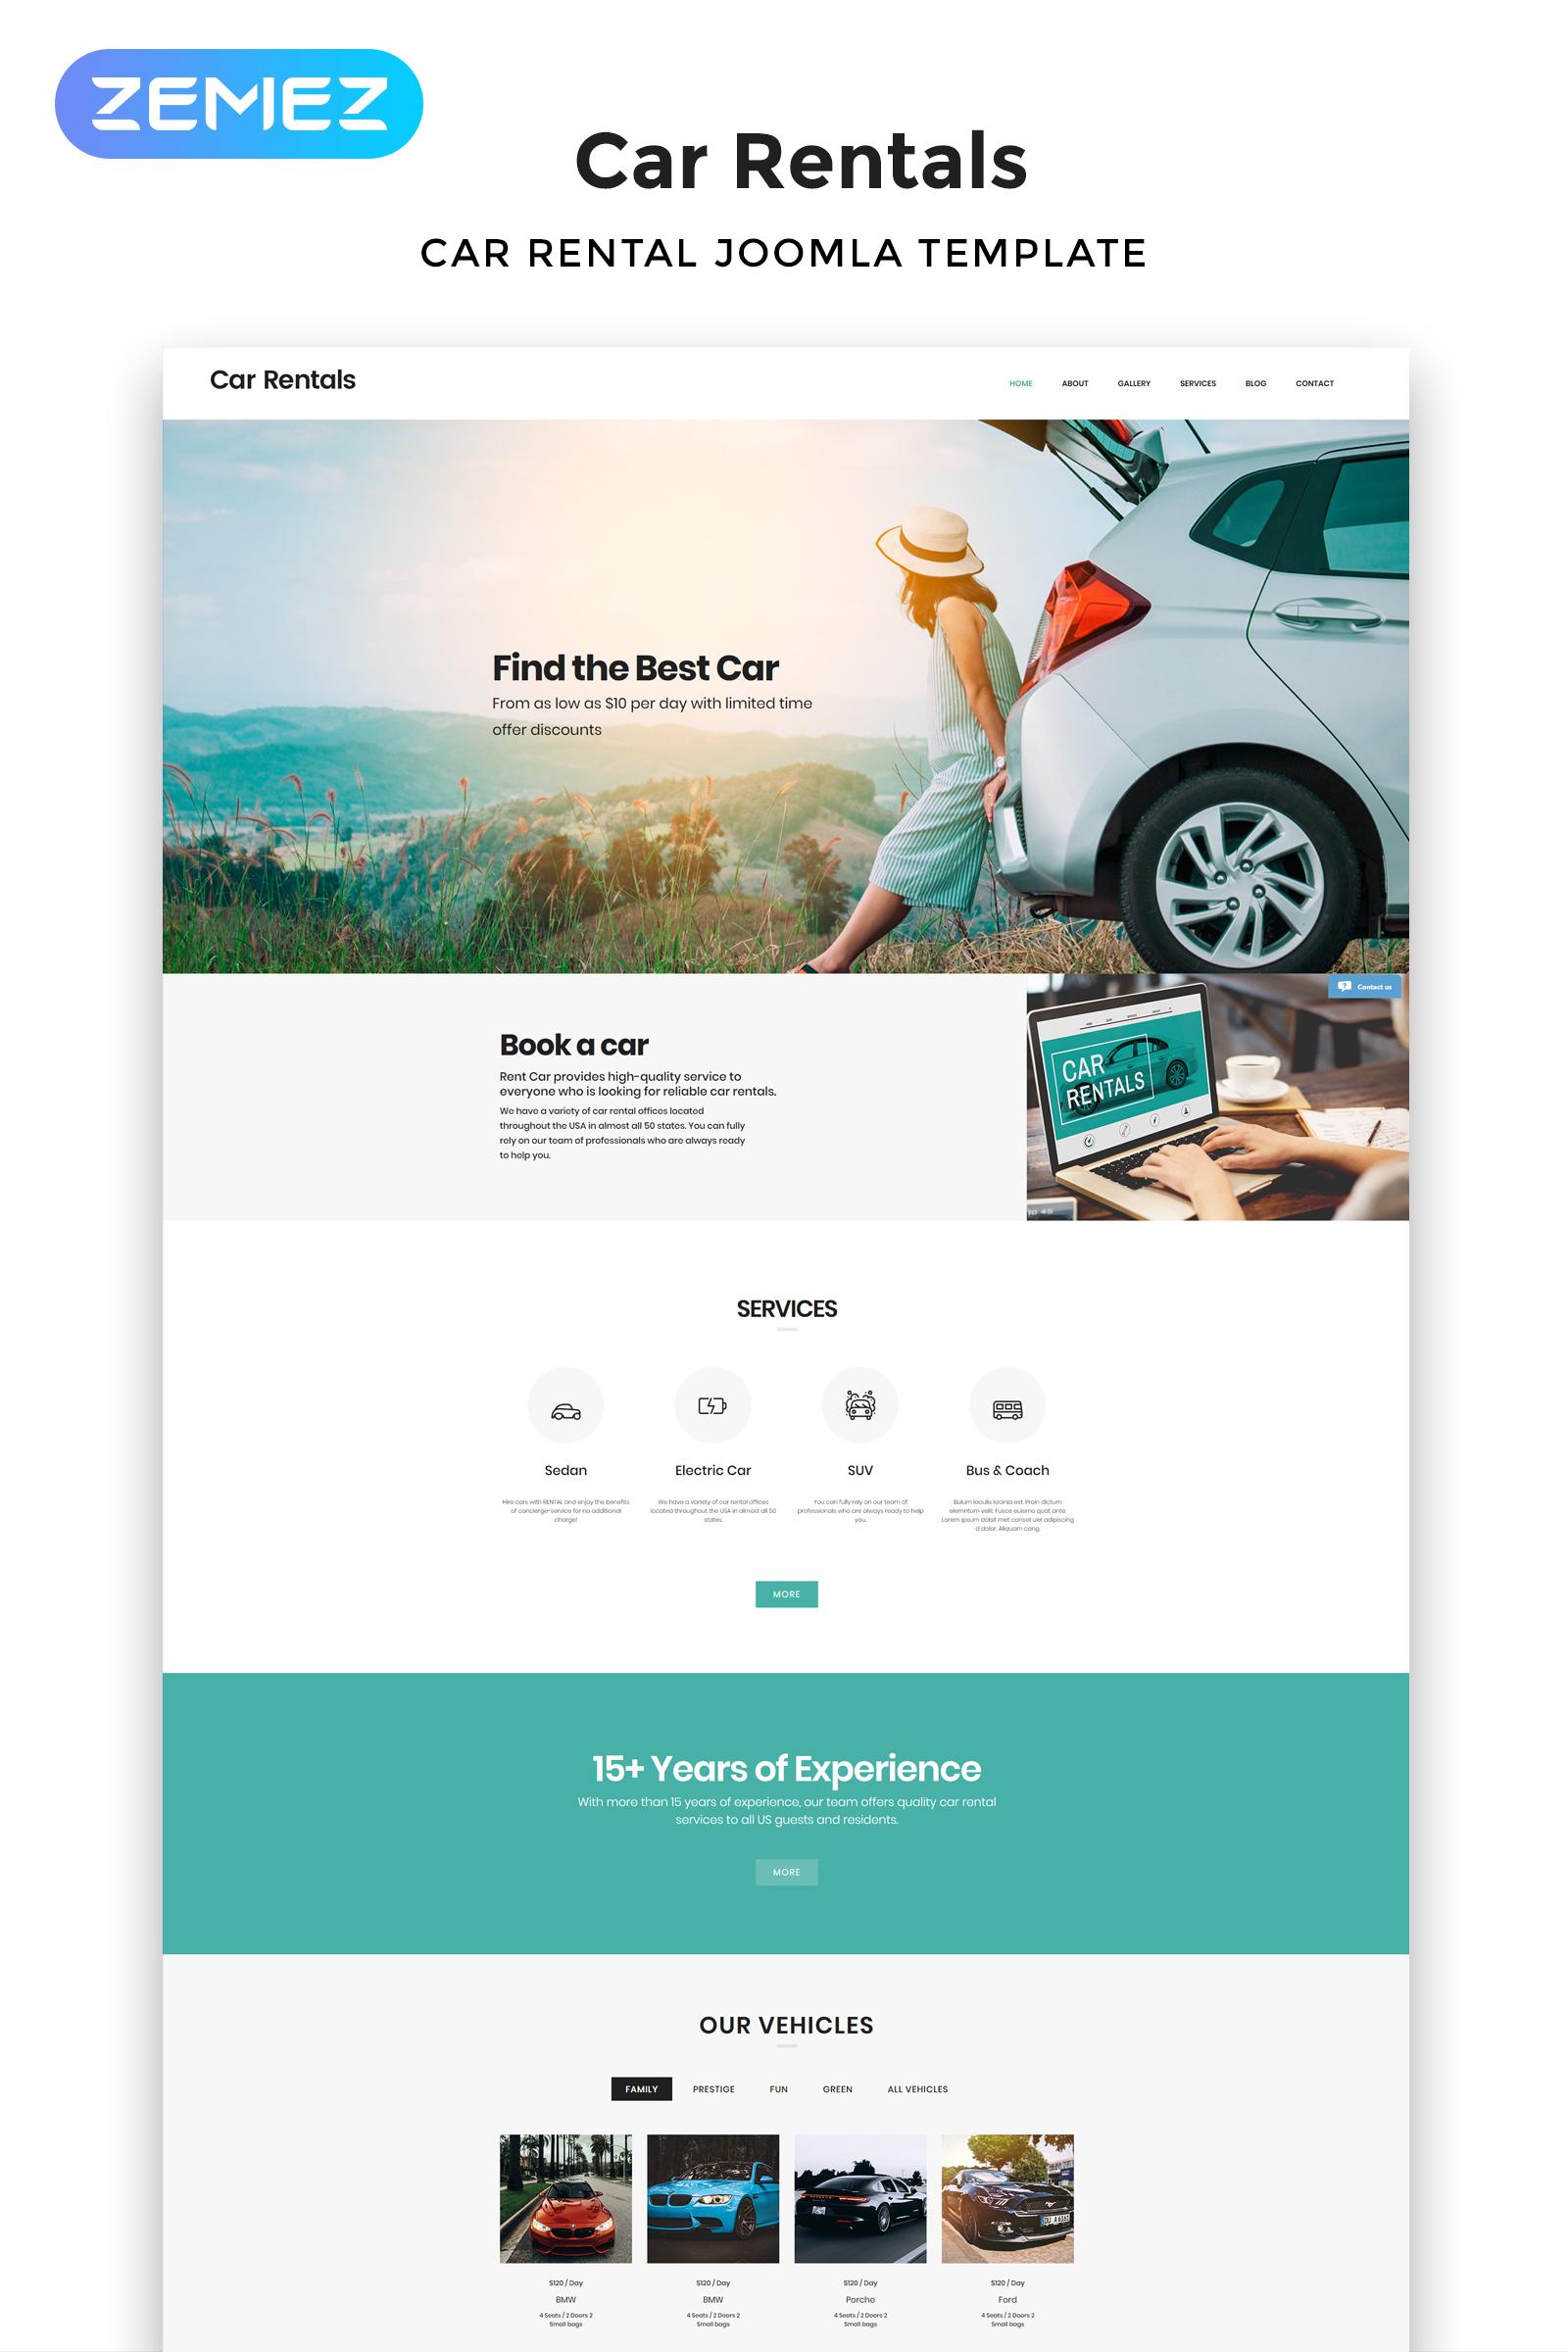 Car Rentals - Car Rental Responsive Template Joomla №53134